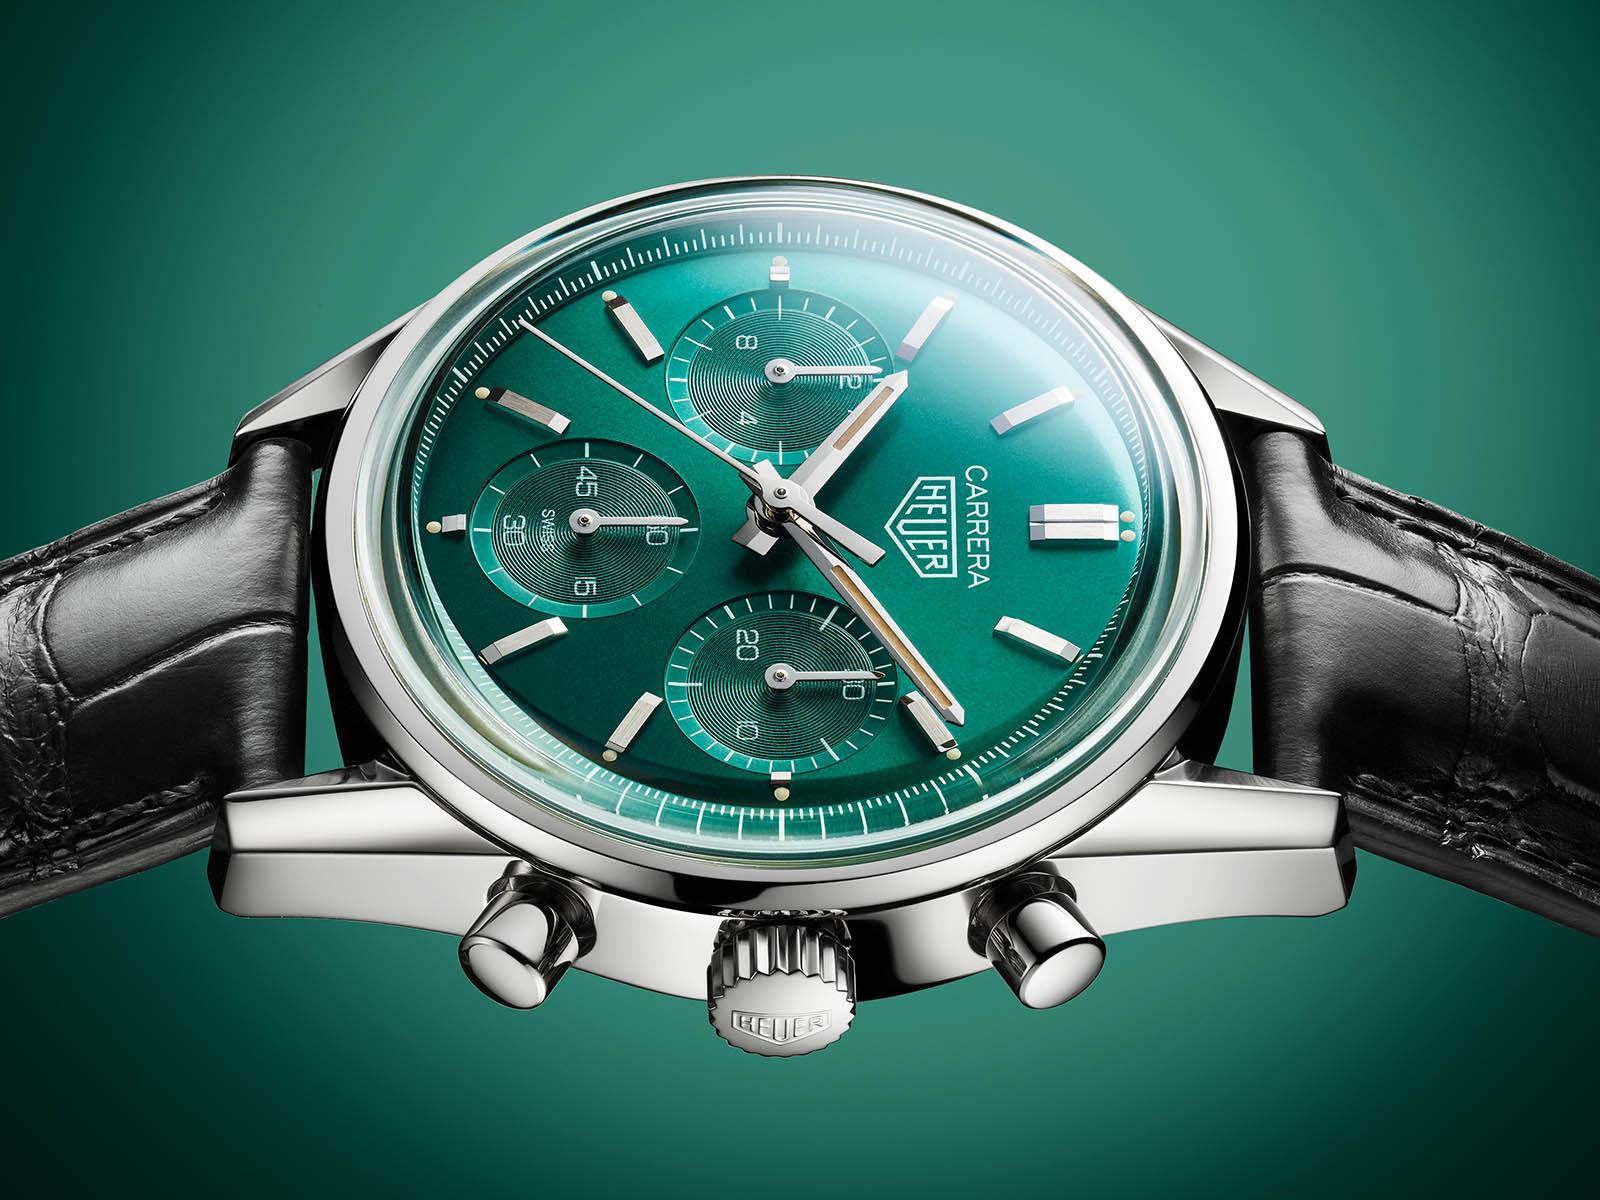 cbk221f-fc6479-tag-heuer-carrera-green-special-edition-4.jpg